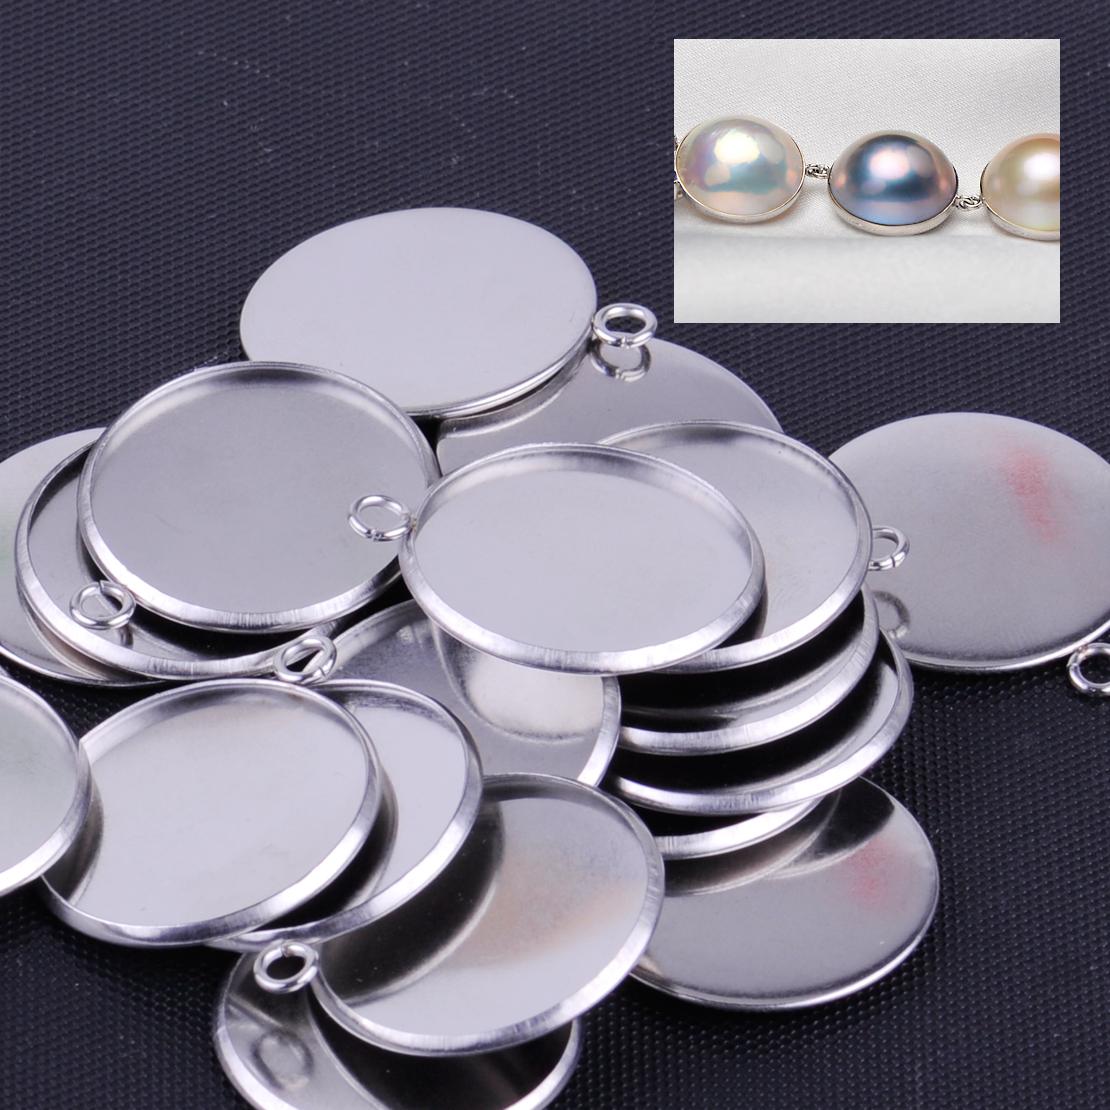 20Pcs Blank Bezel Tray Base for Pendants Cabochon Setting Jewelry DIY Crafts